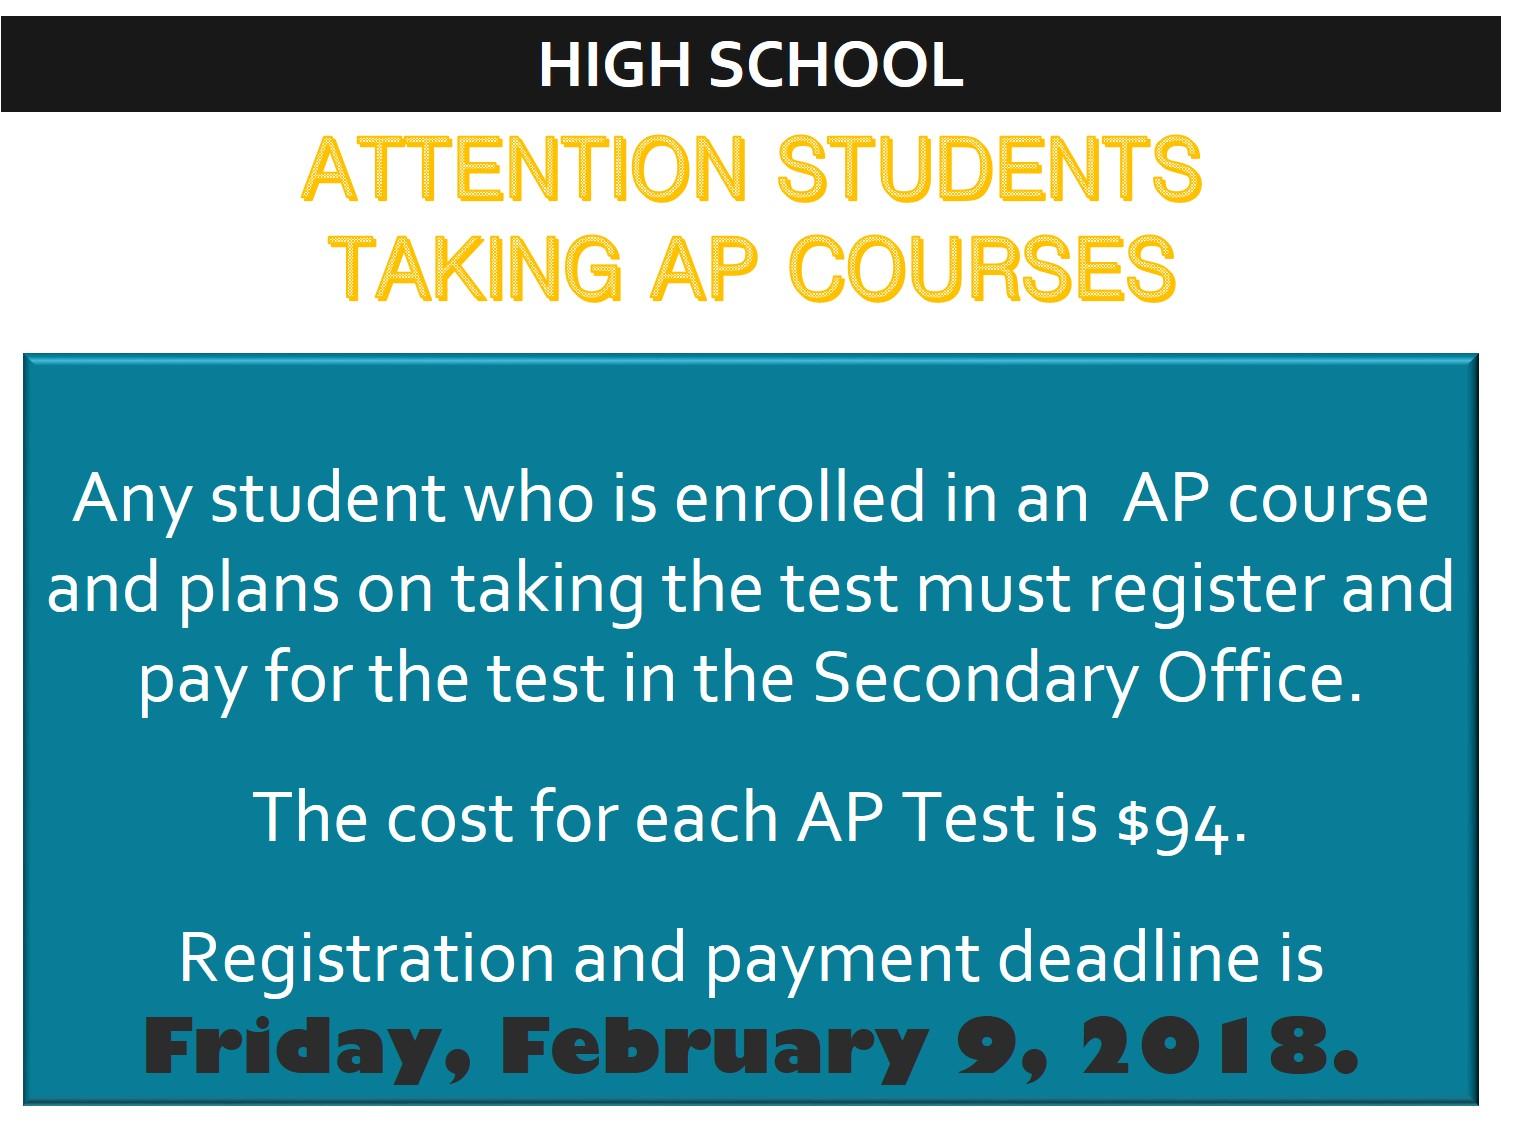 ap-test-registration.jpg